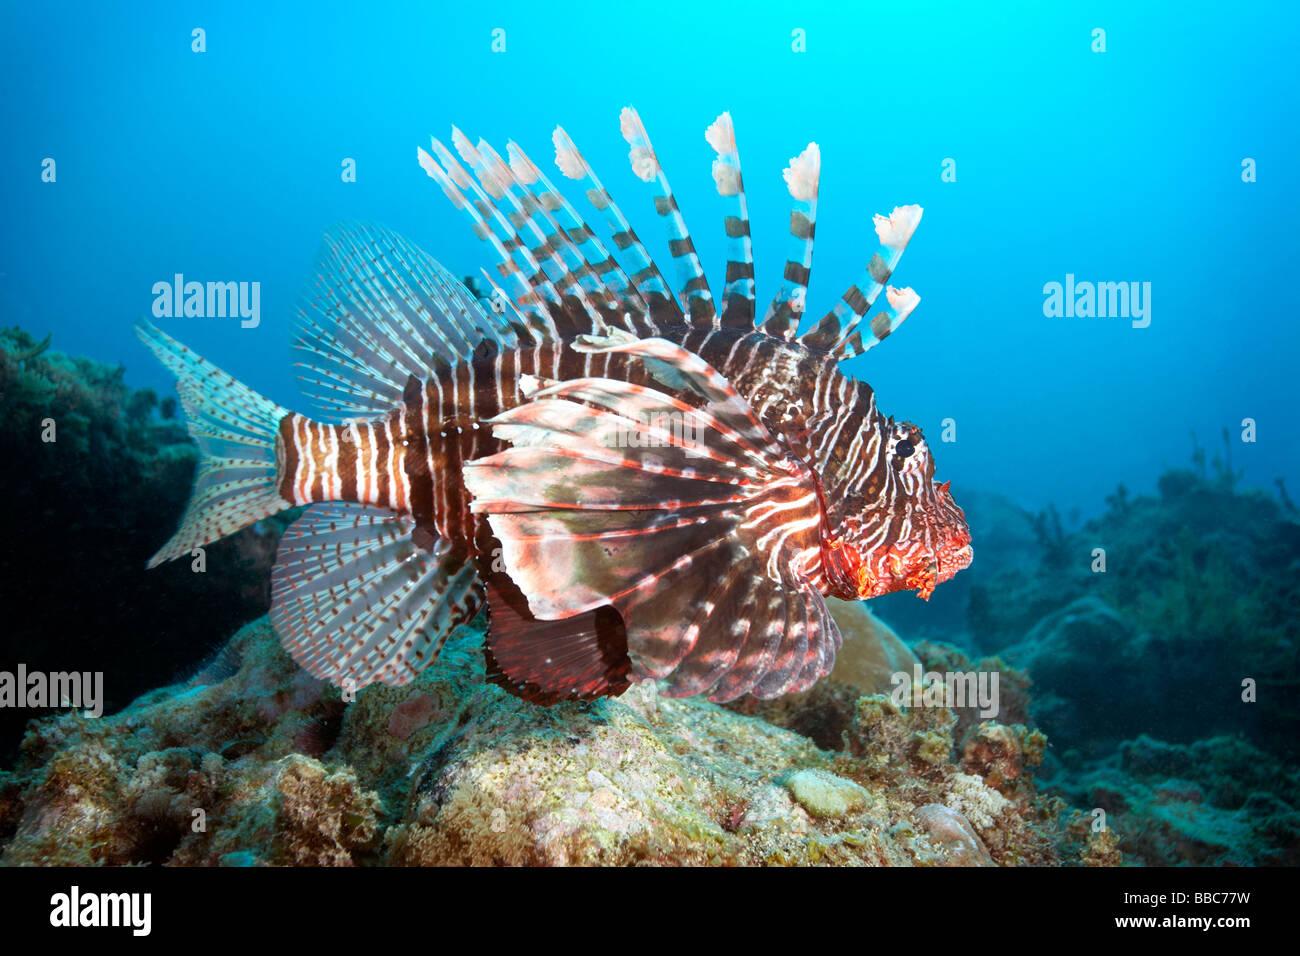 Lion Fish on Mikanda Reef, Zanzibar - Stock Image